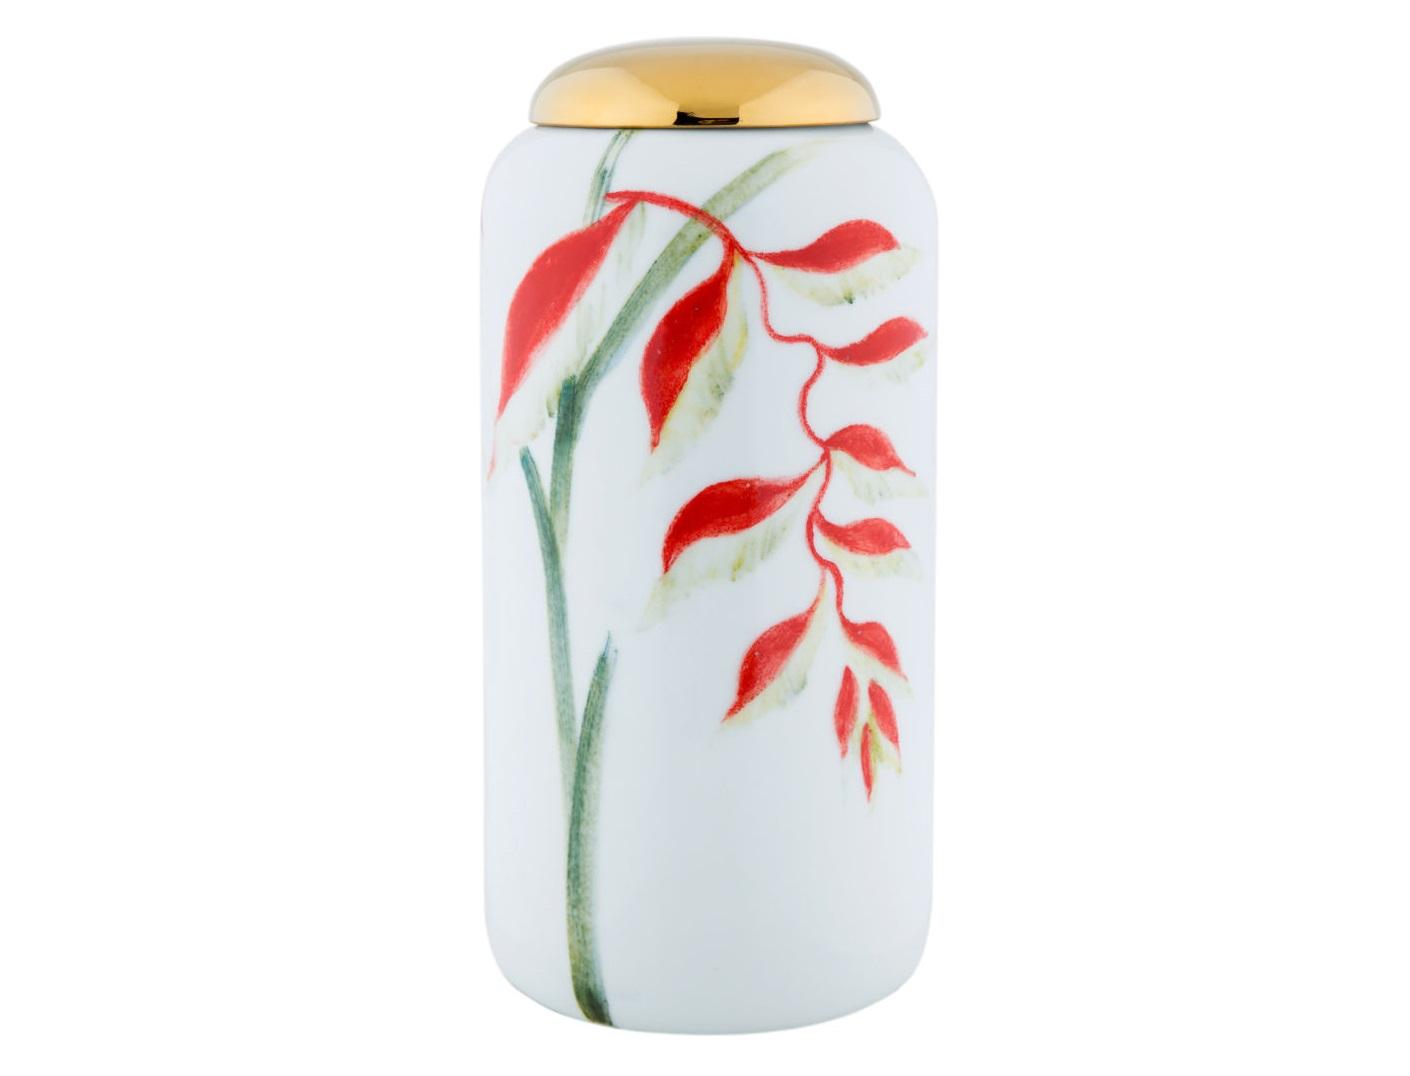 Декоративная ваза M-Style 15436505 от thefurnish